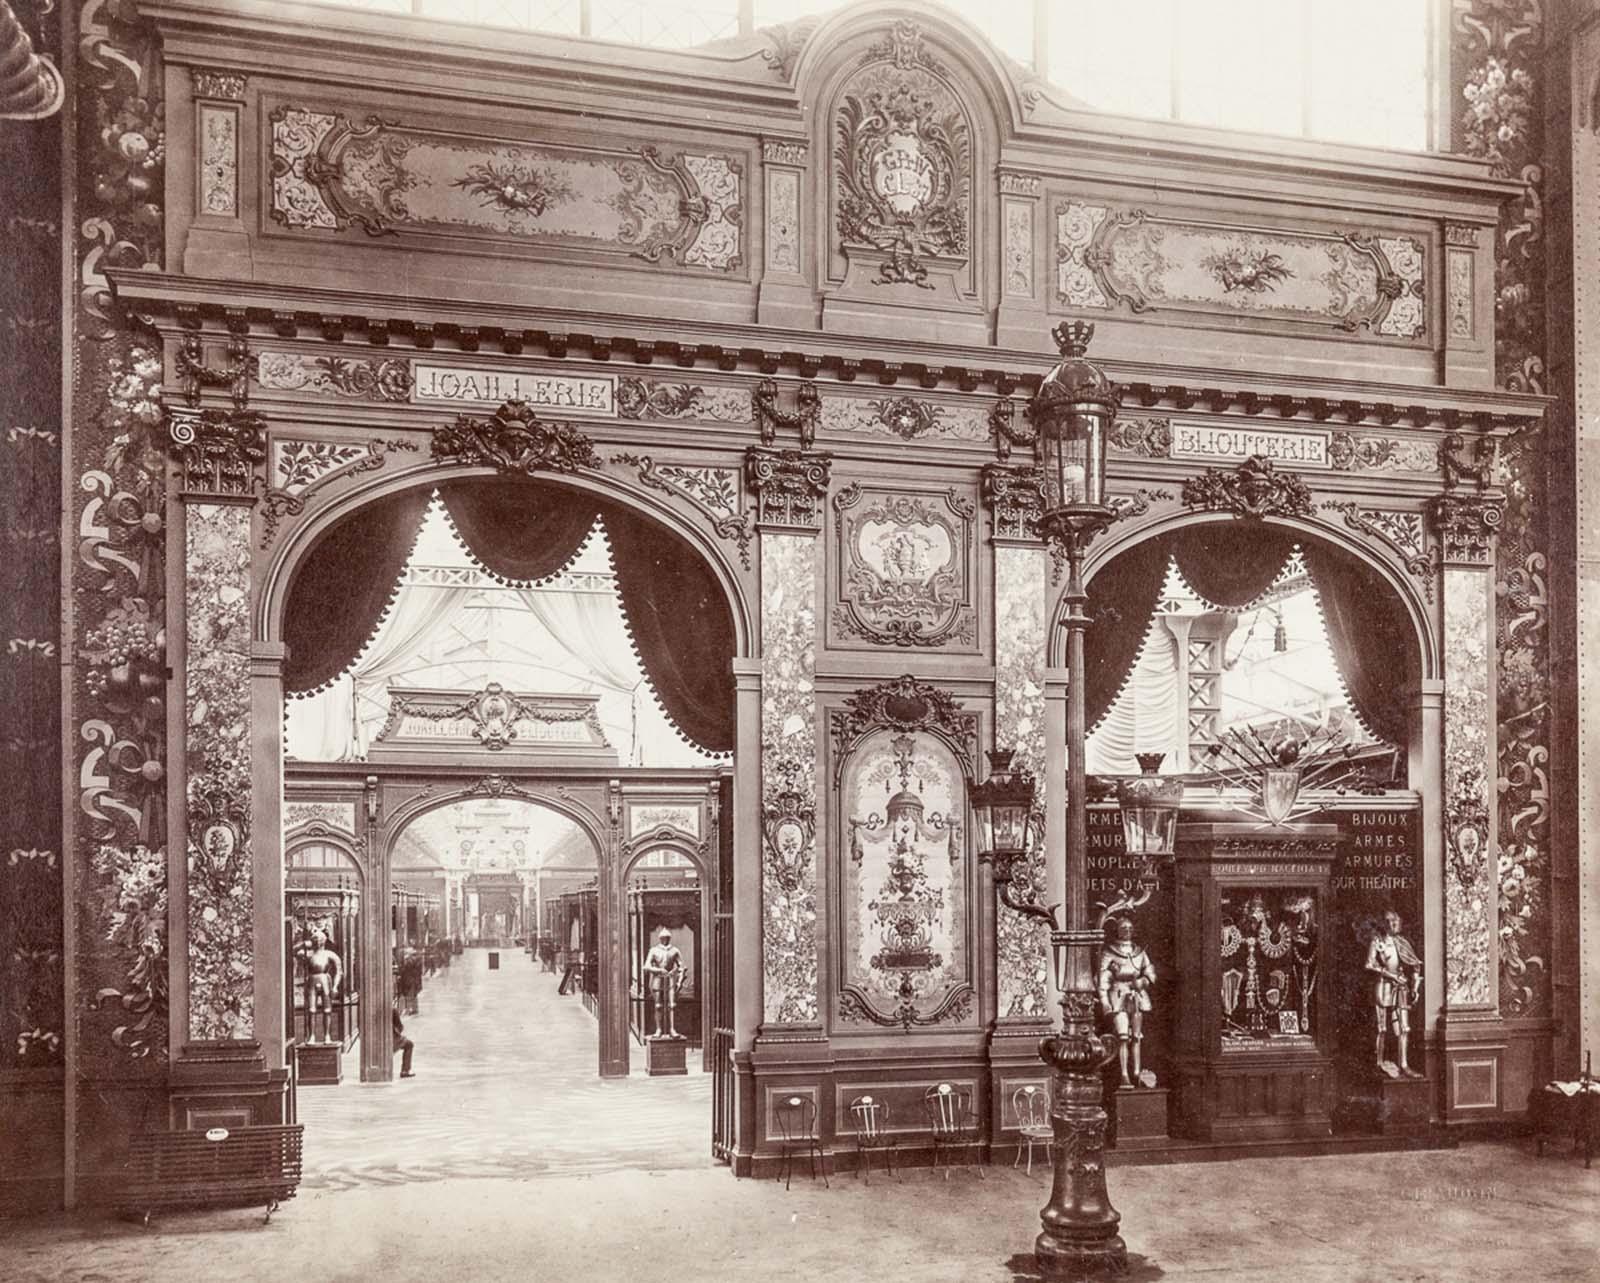 The jewelry exhibition.